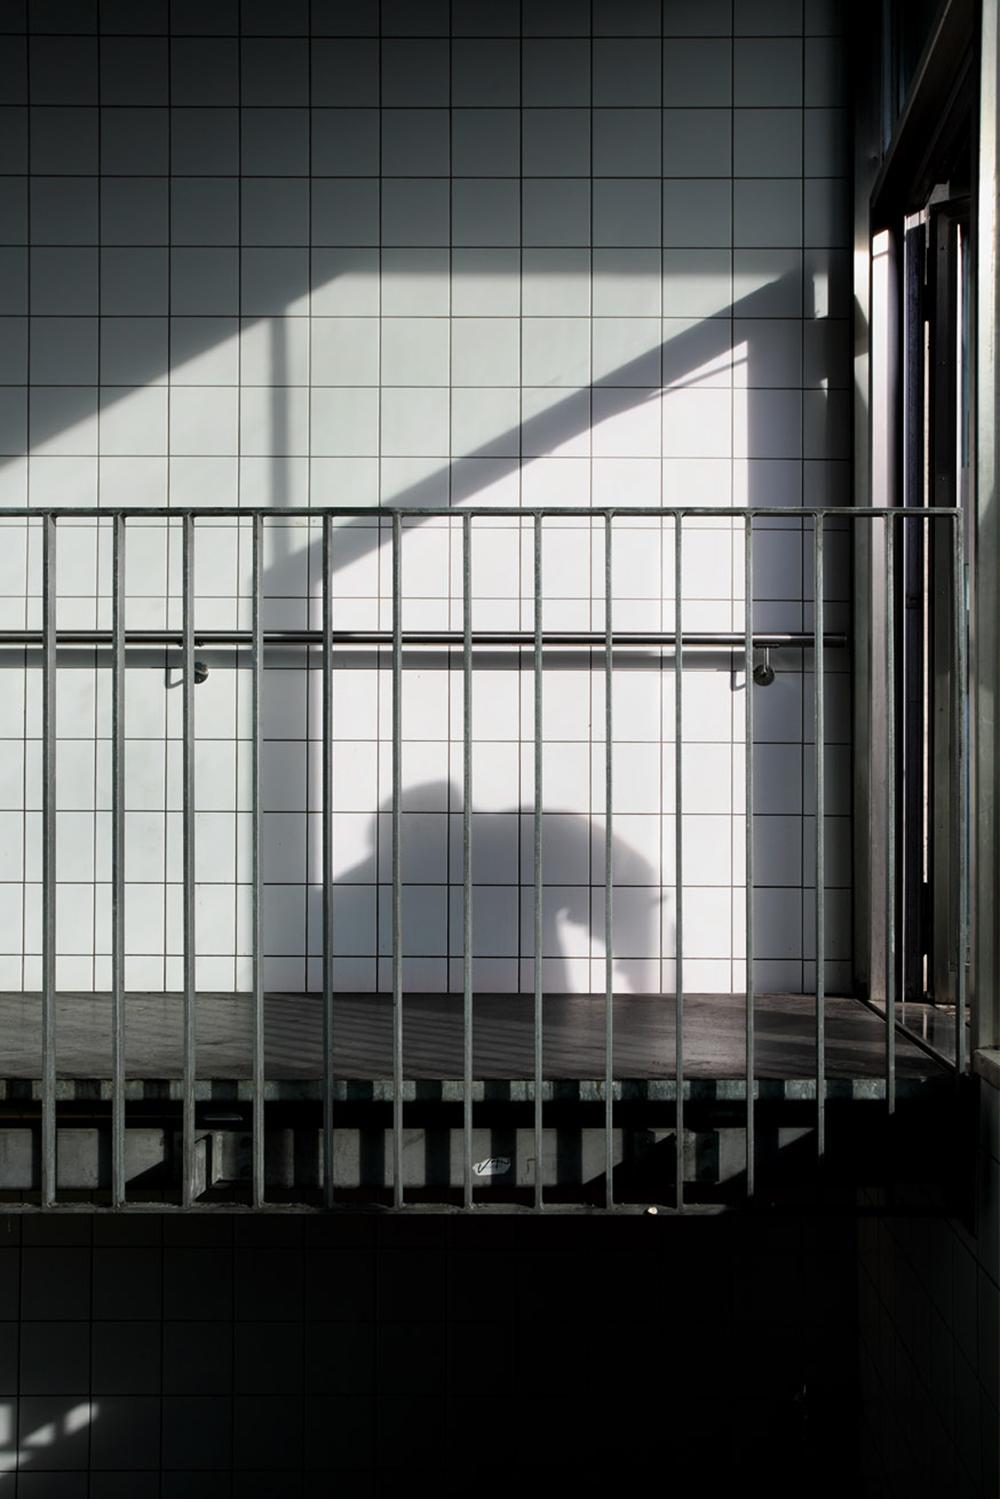 Trevor Skinner Bahnhof Parkplatz - Sóc Sant Feliu de Guíxols